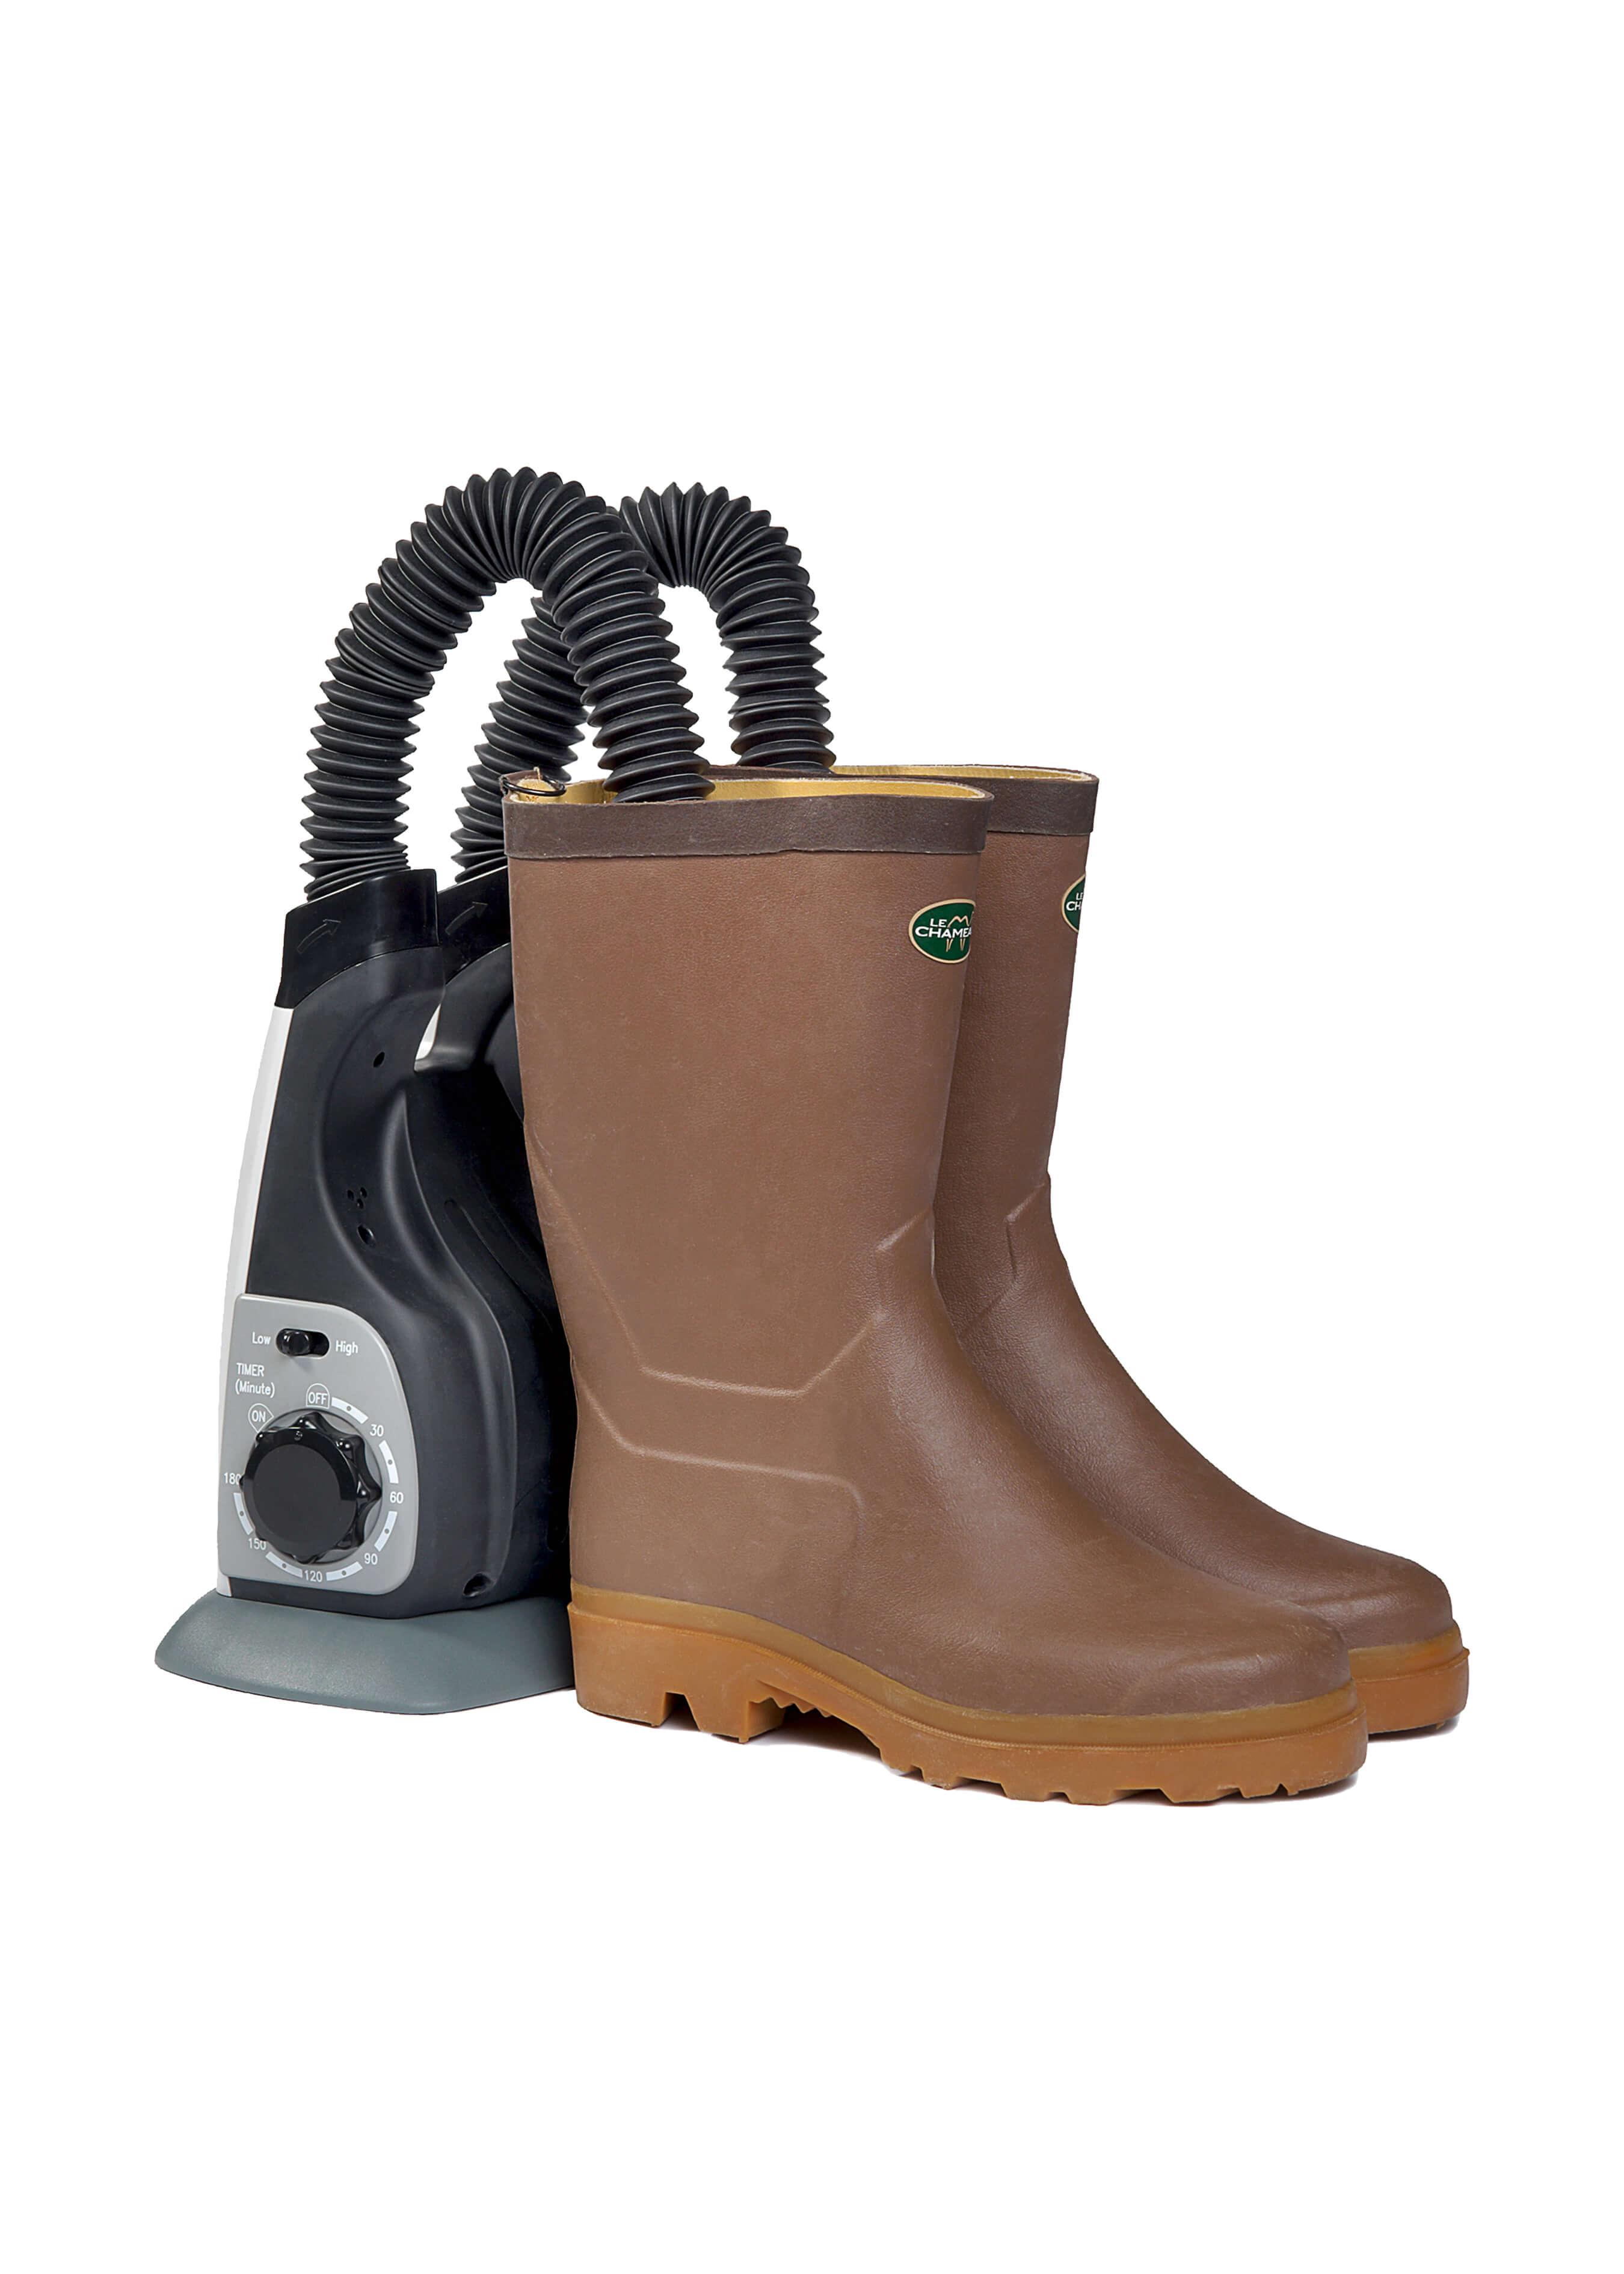 Alpenheat AD2 Schuhtrockner und Stiefeltrockner / Wärmer L2166 2